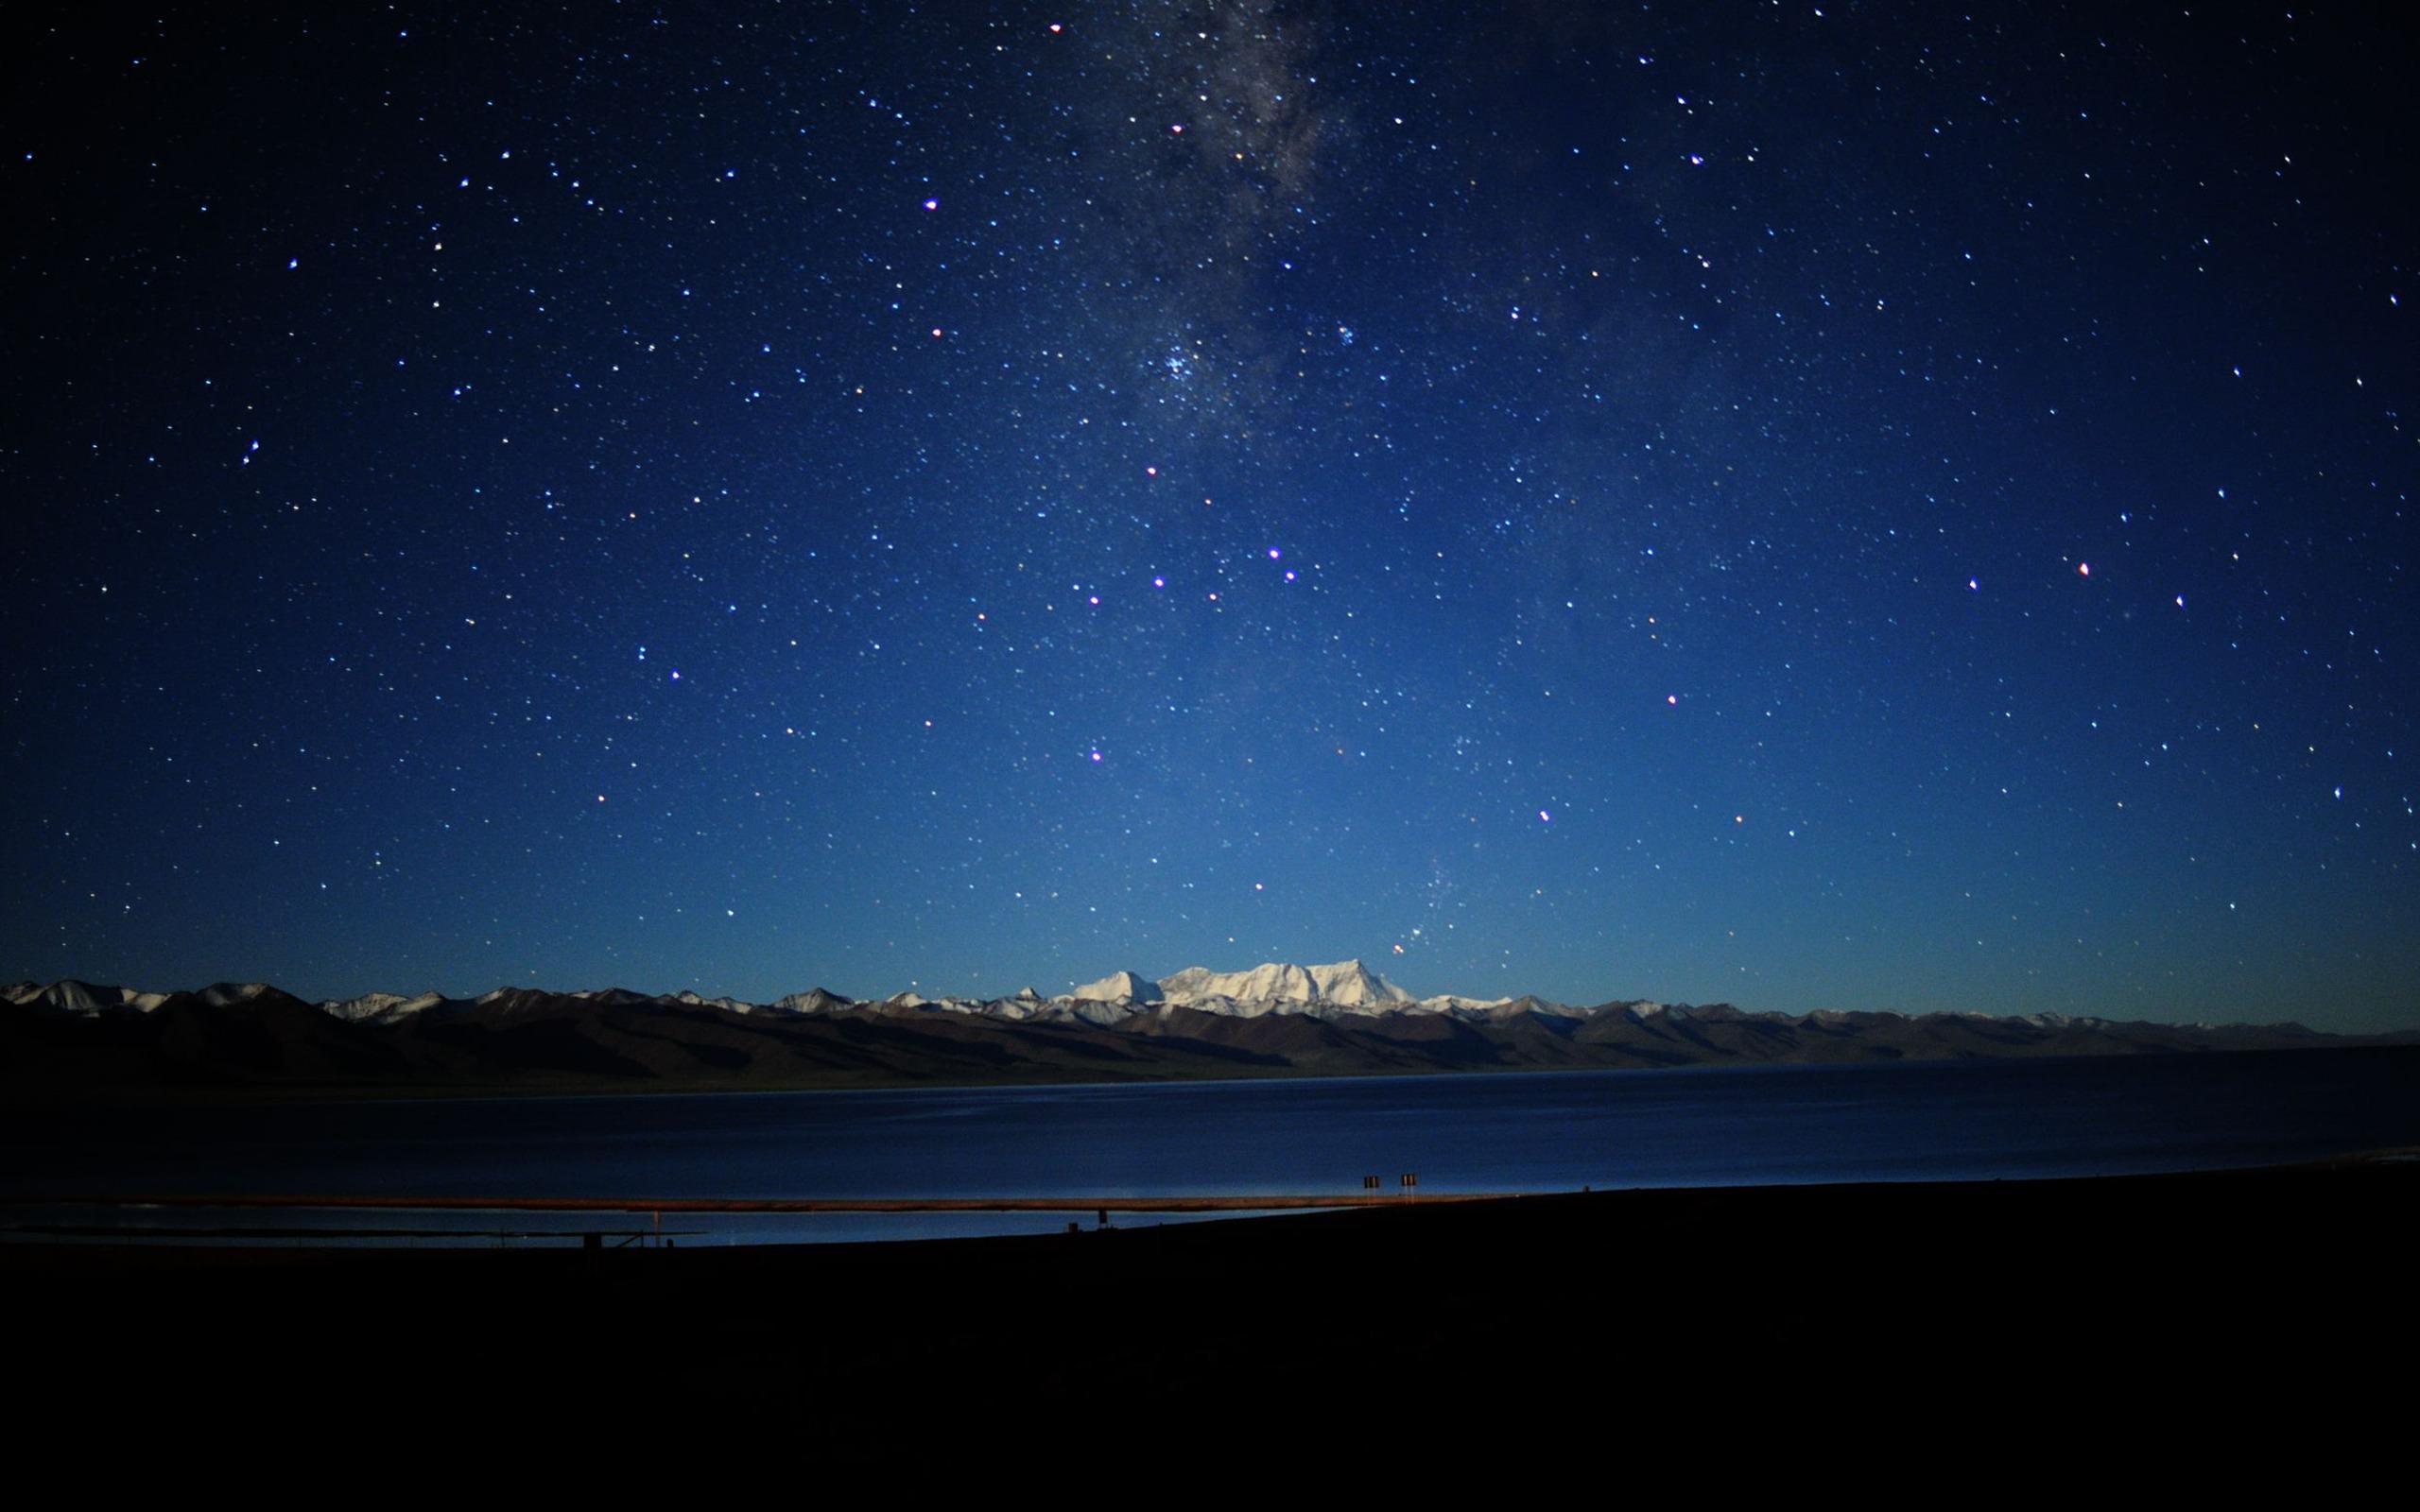 Night Sky Wallpaper Night Sky hd Wallpapers